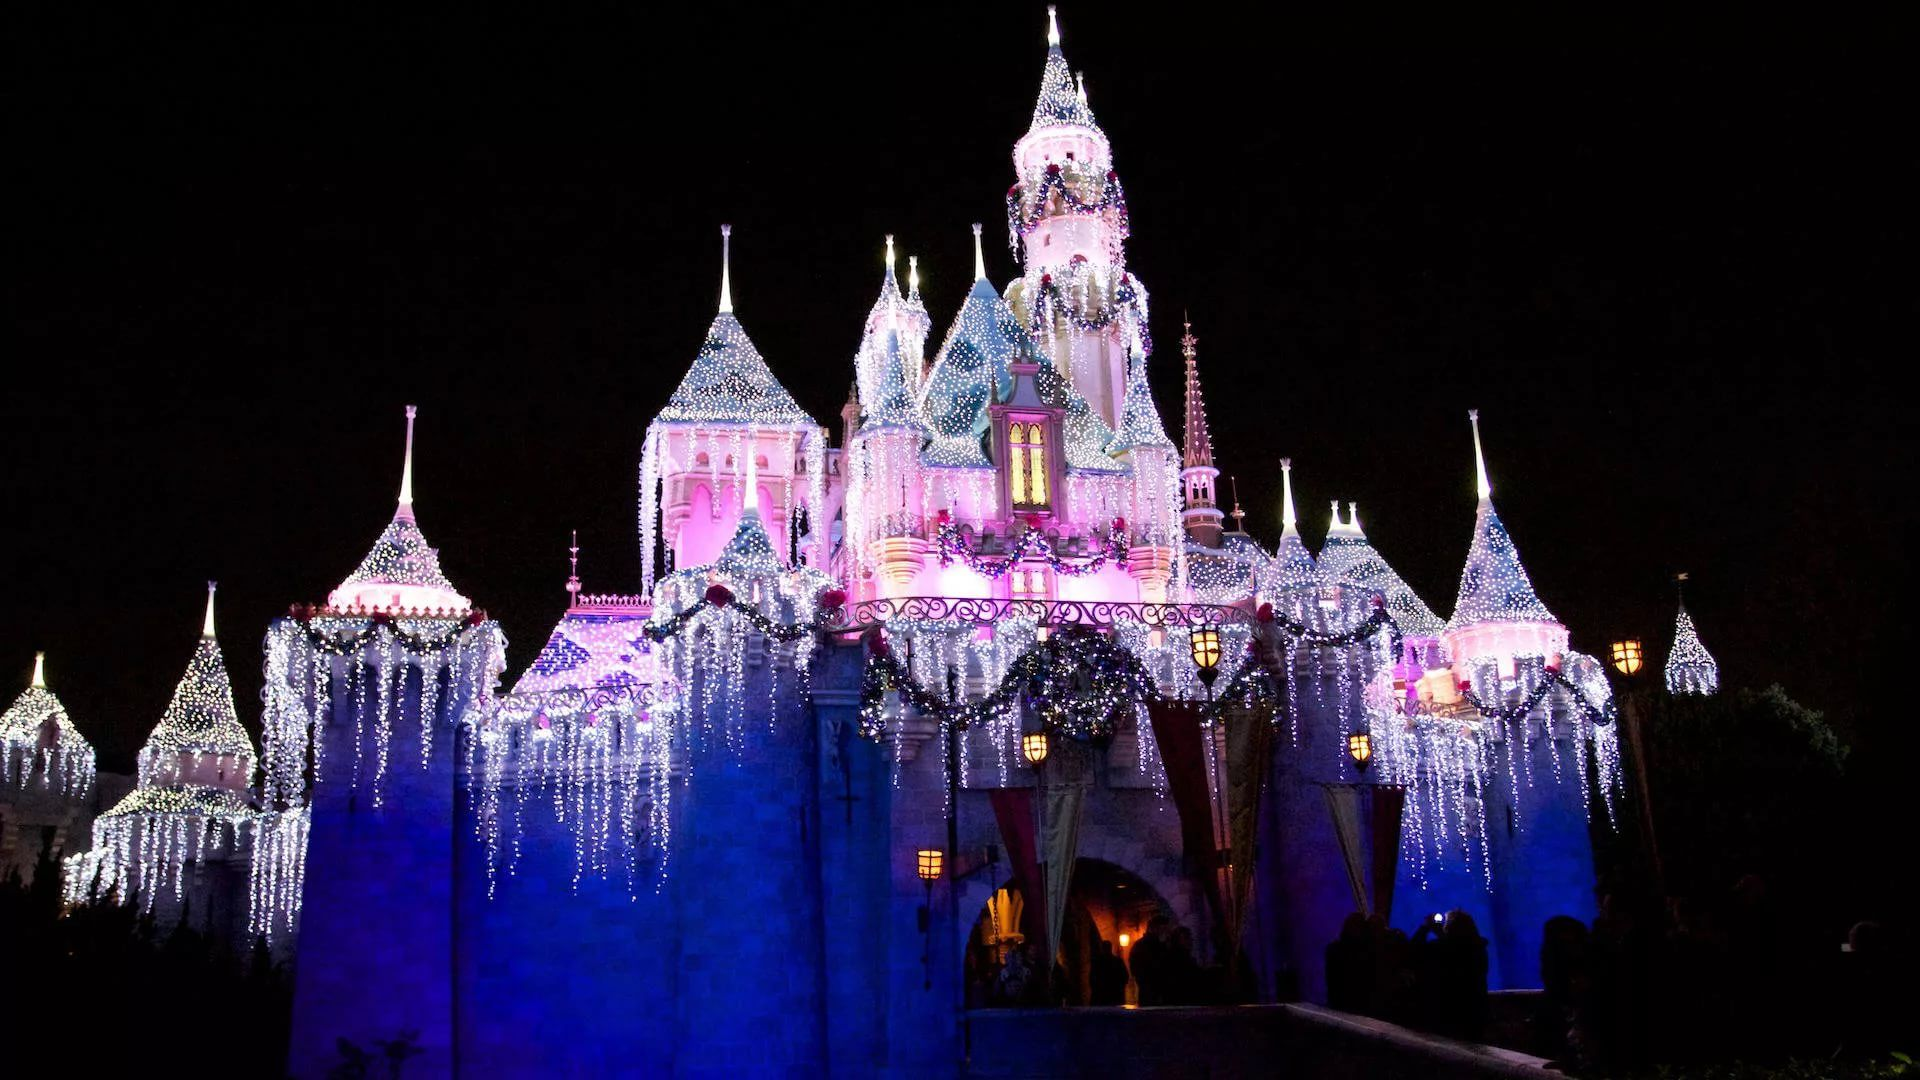 Disney Christmas Background Wallpaper HD